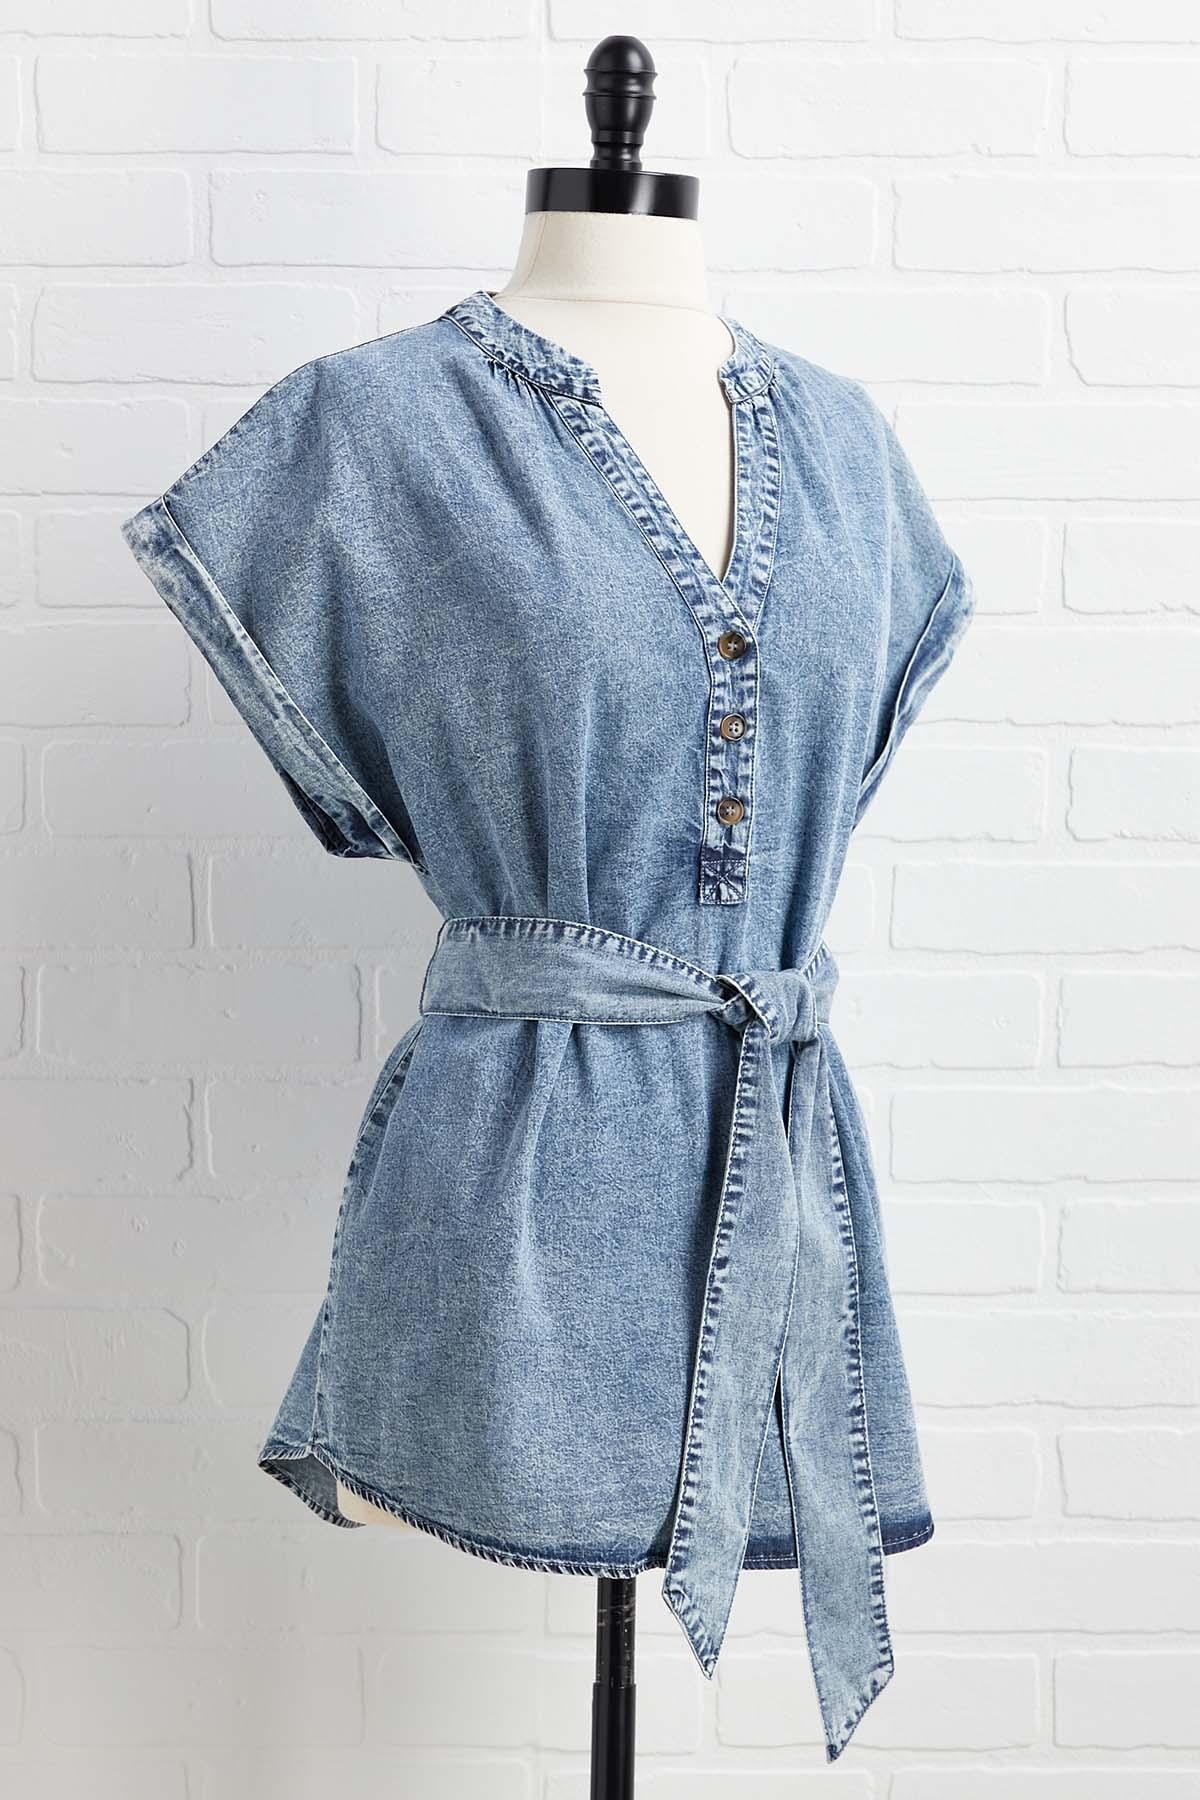 Blue Jean Babydoll Top